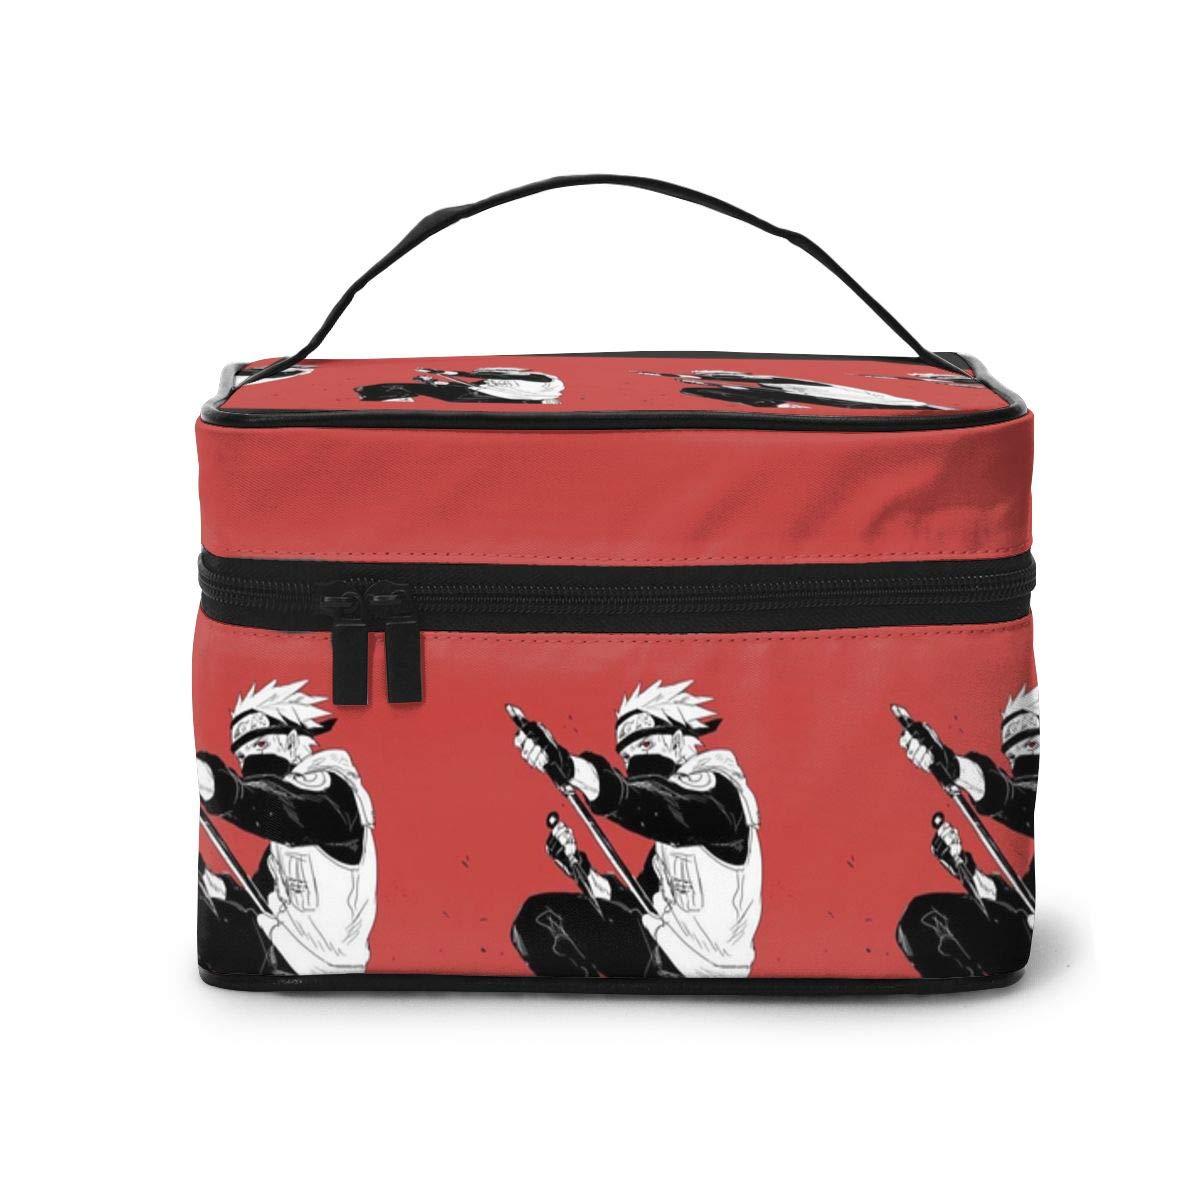 Makeup Bag, Naruto Kakashi Travel Portable Cosmetic Bag Large Pouch Mesh Brush Organizer Toiletry Bag for Women Girls